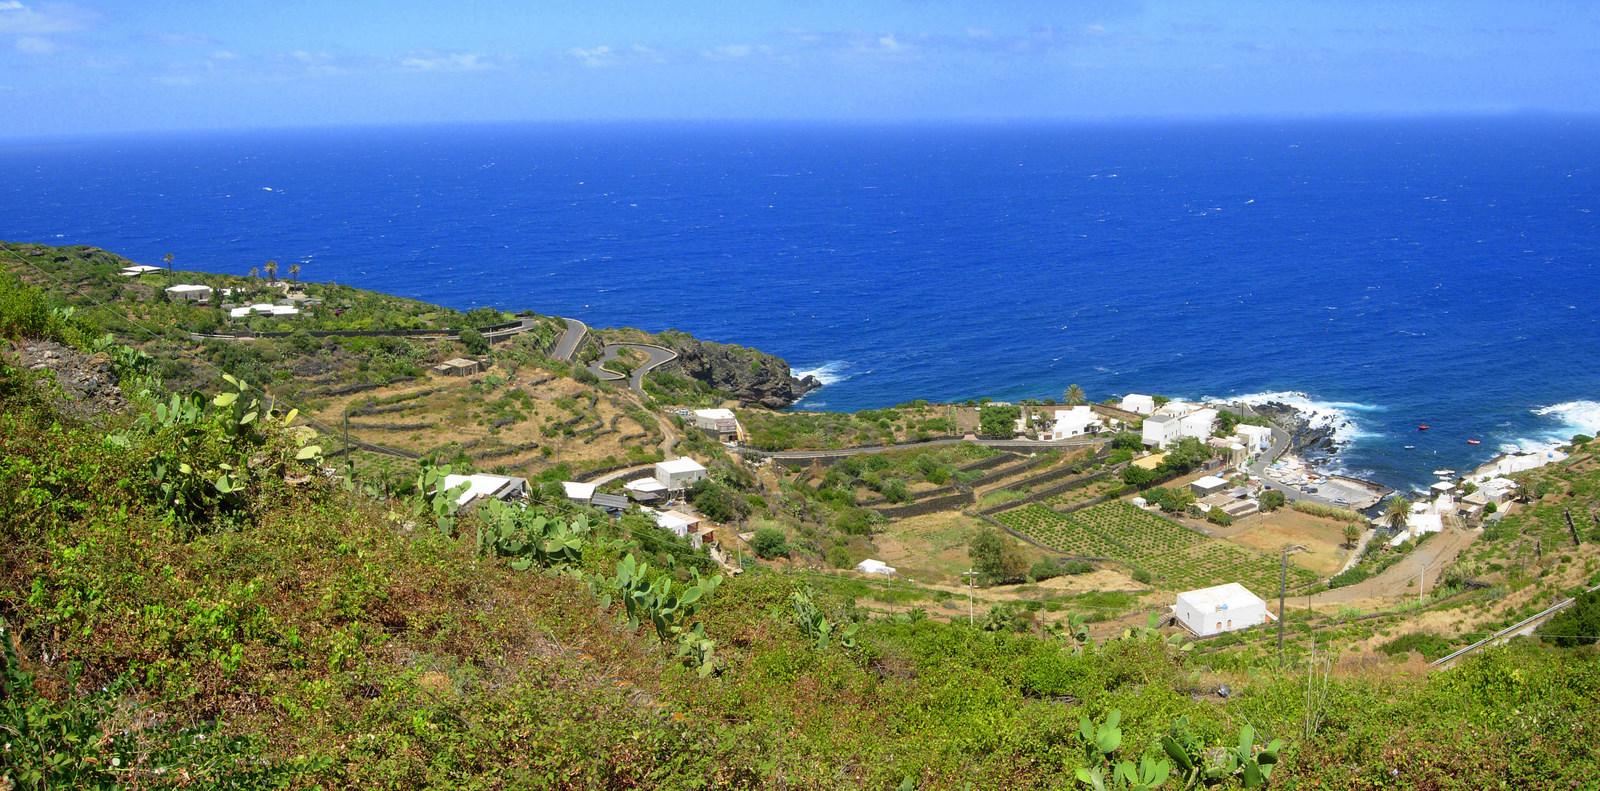 Things to do in Pantelleria, Sicilia - Pantelleria  - Visit Italy